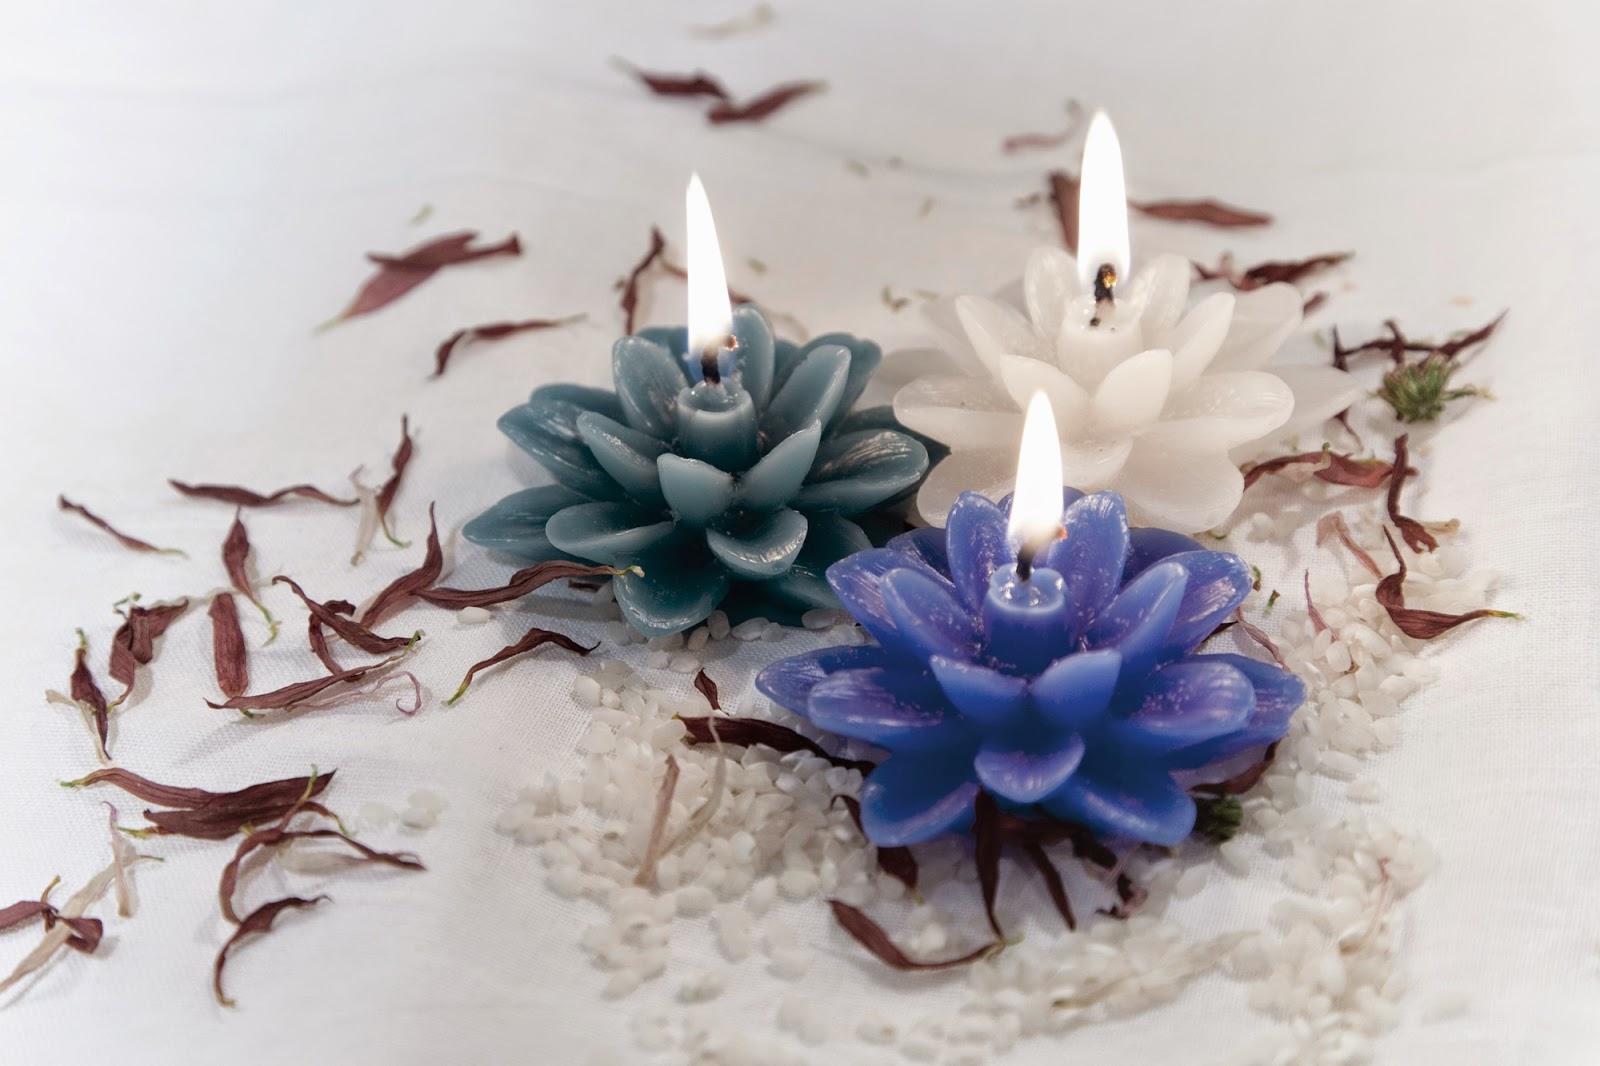 Las Velas de tu Boda - Envelados Mush - Ceremonia de la luz